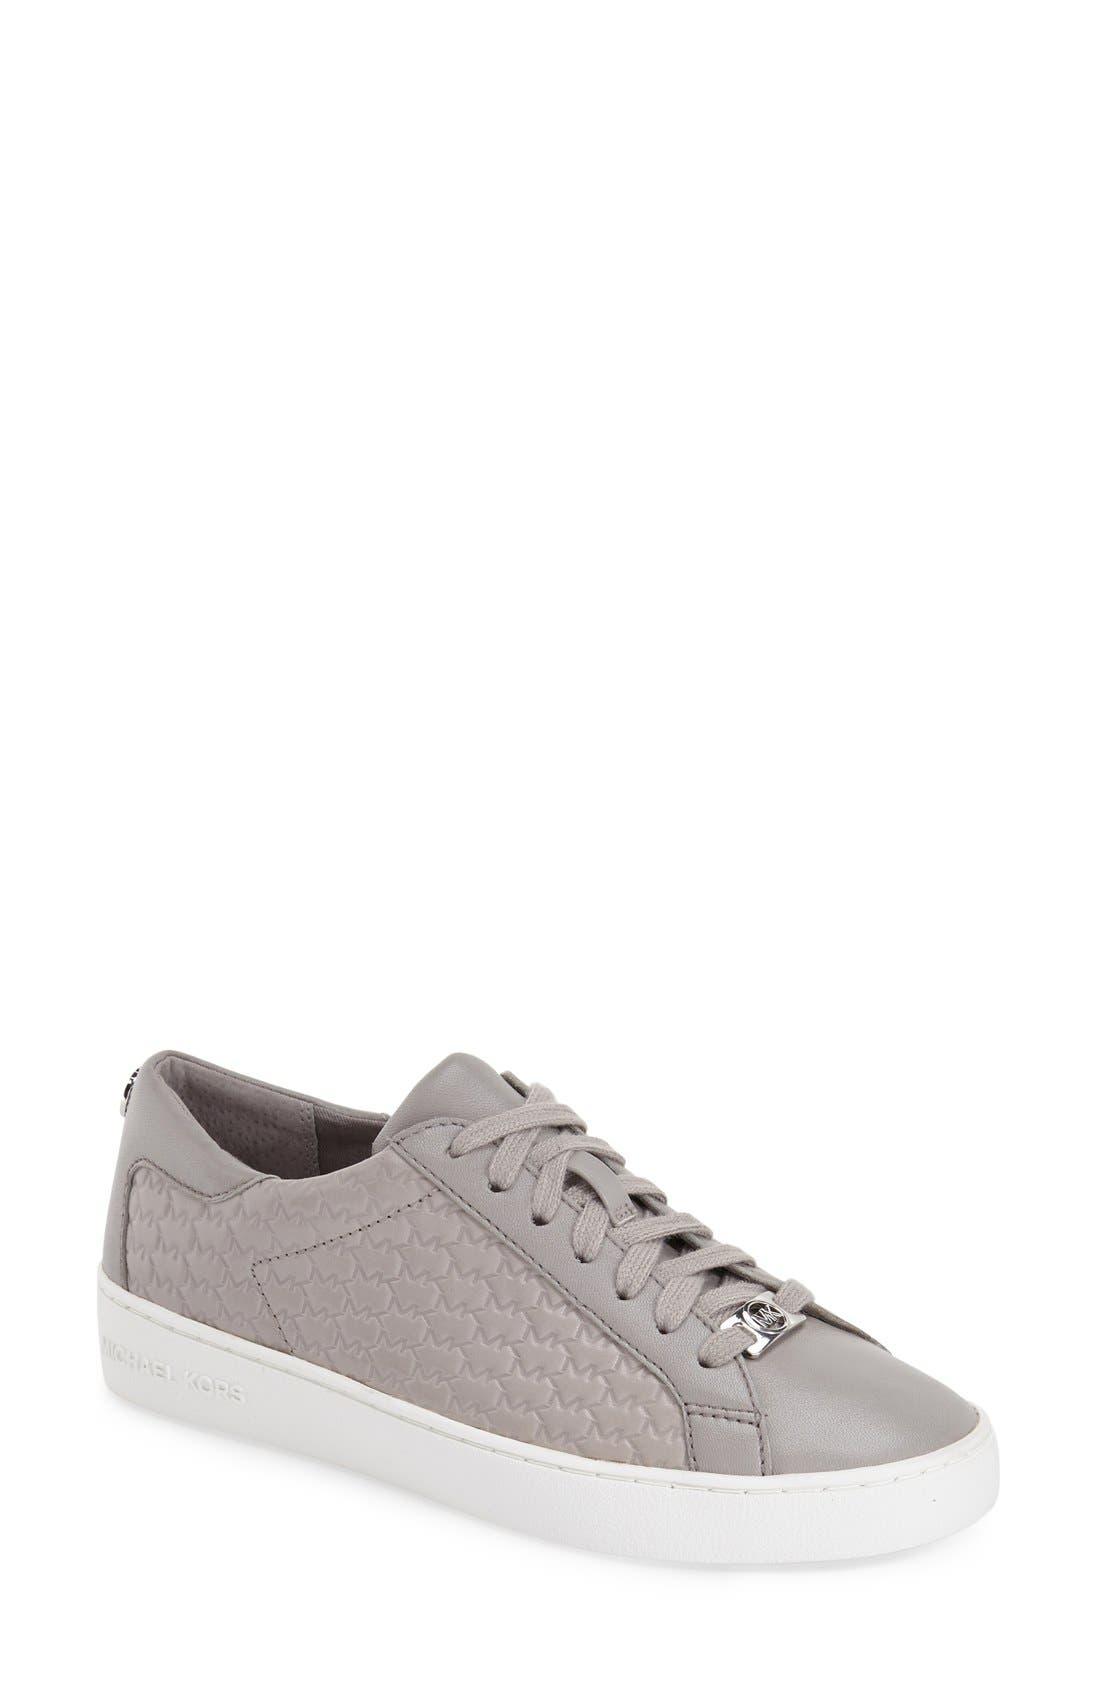 Main Image - MICHAEL Michael Kors 'Colby' Textured Sneaker (Women)